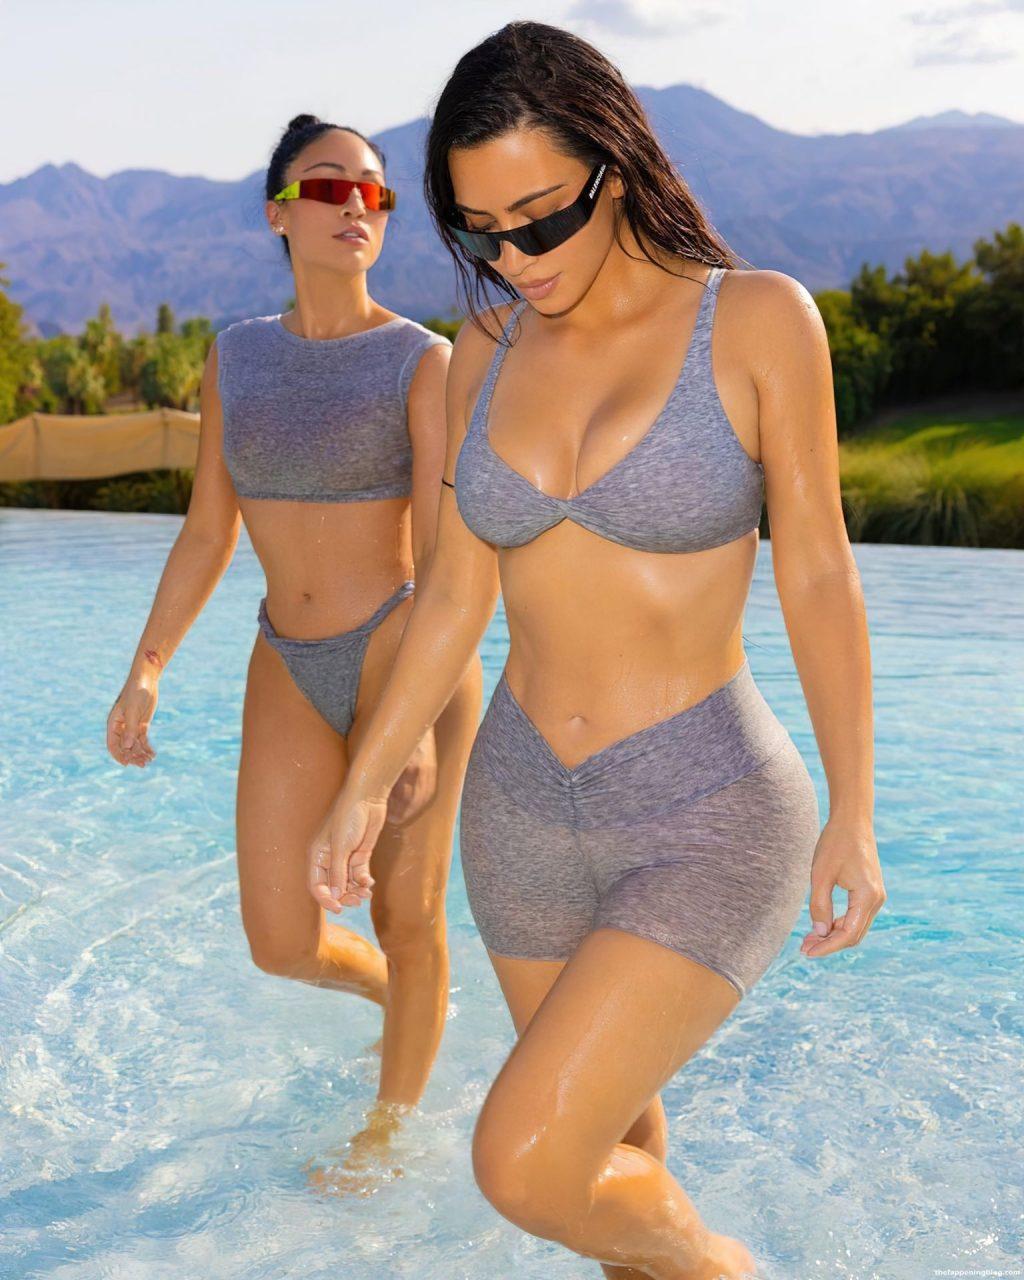 Kim Kardashian & Steph Shepherd Promote a New SKIMS Collection (17 Photos) [Updated]